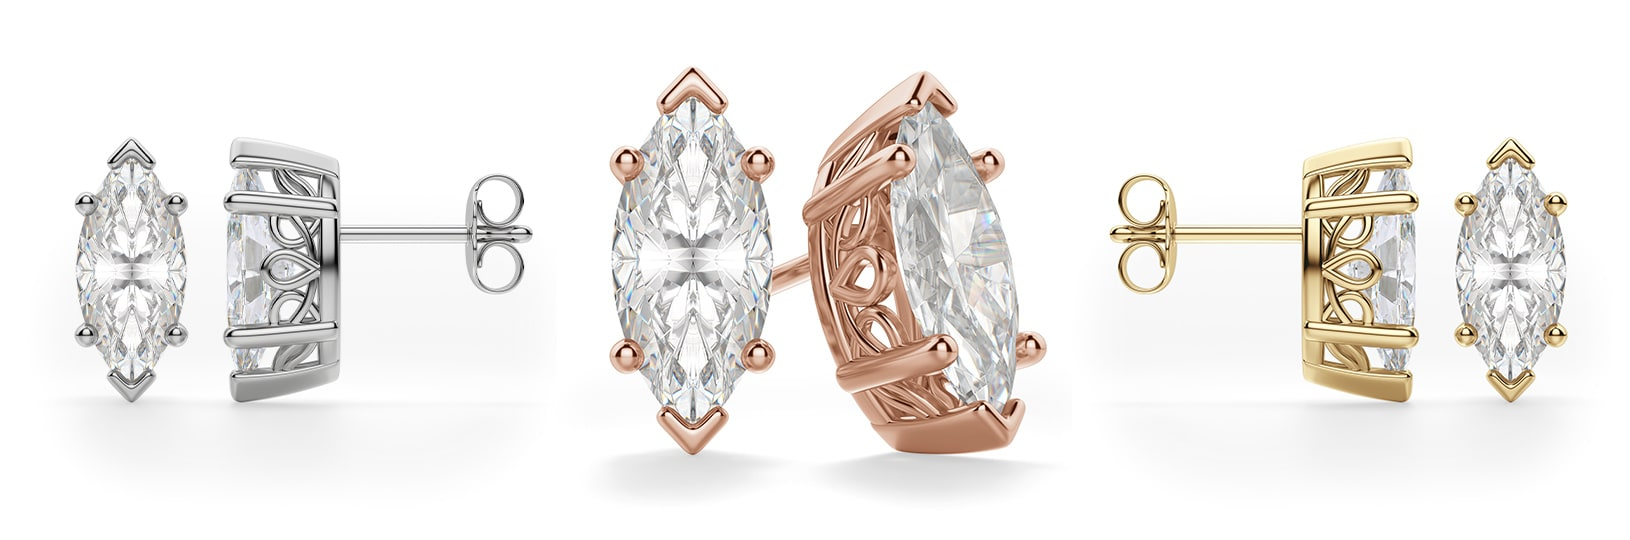 Marquise cut filigree earrings